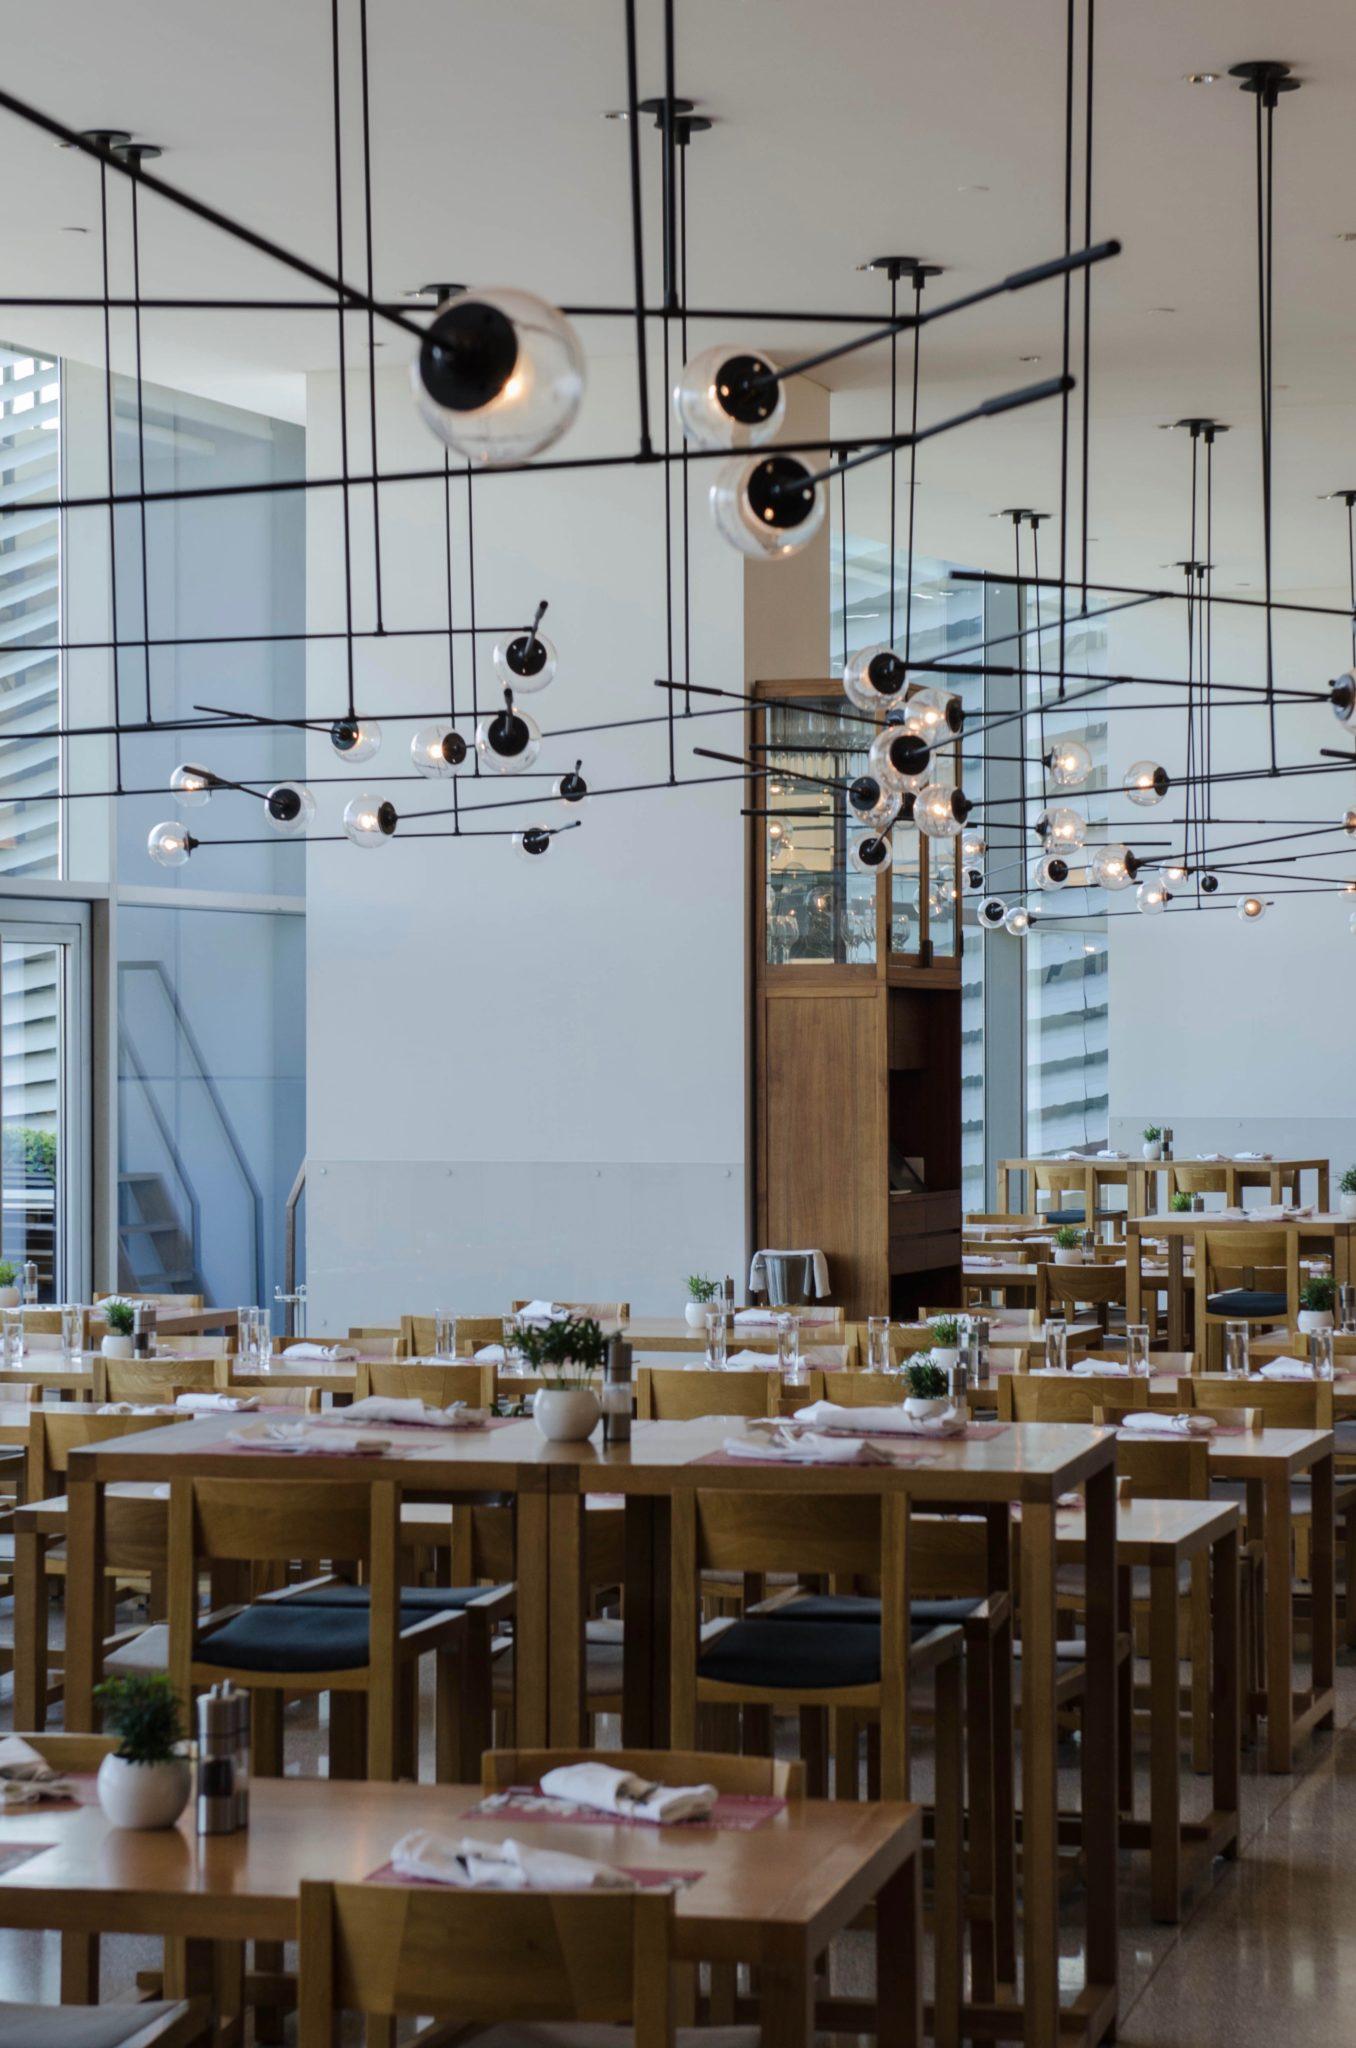 EAST Hotel Peking: Frühstück ist das Highlight im EAST